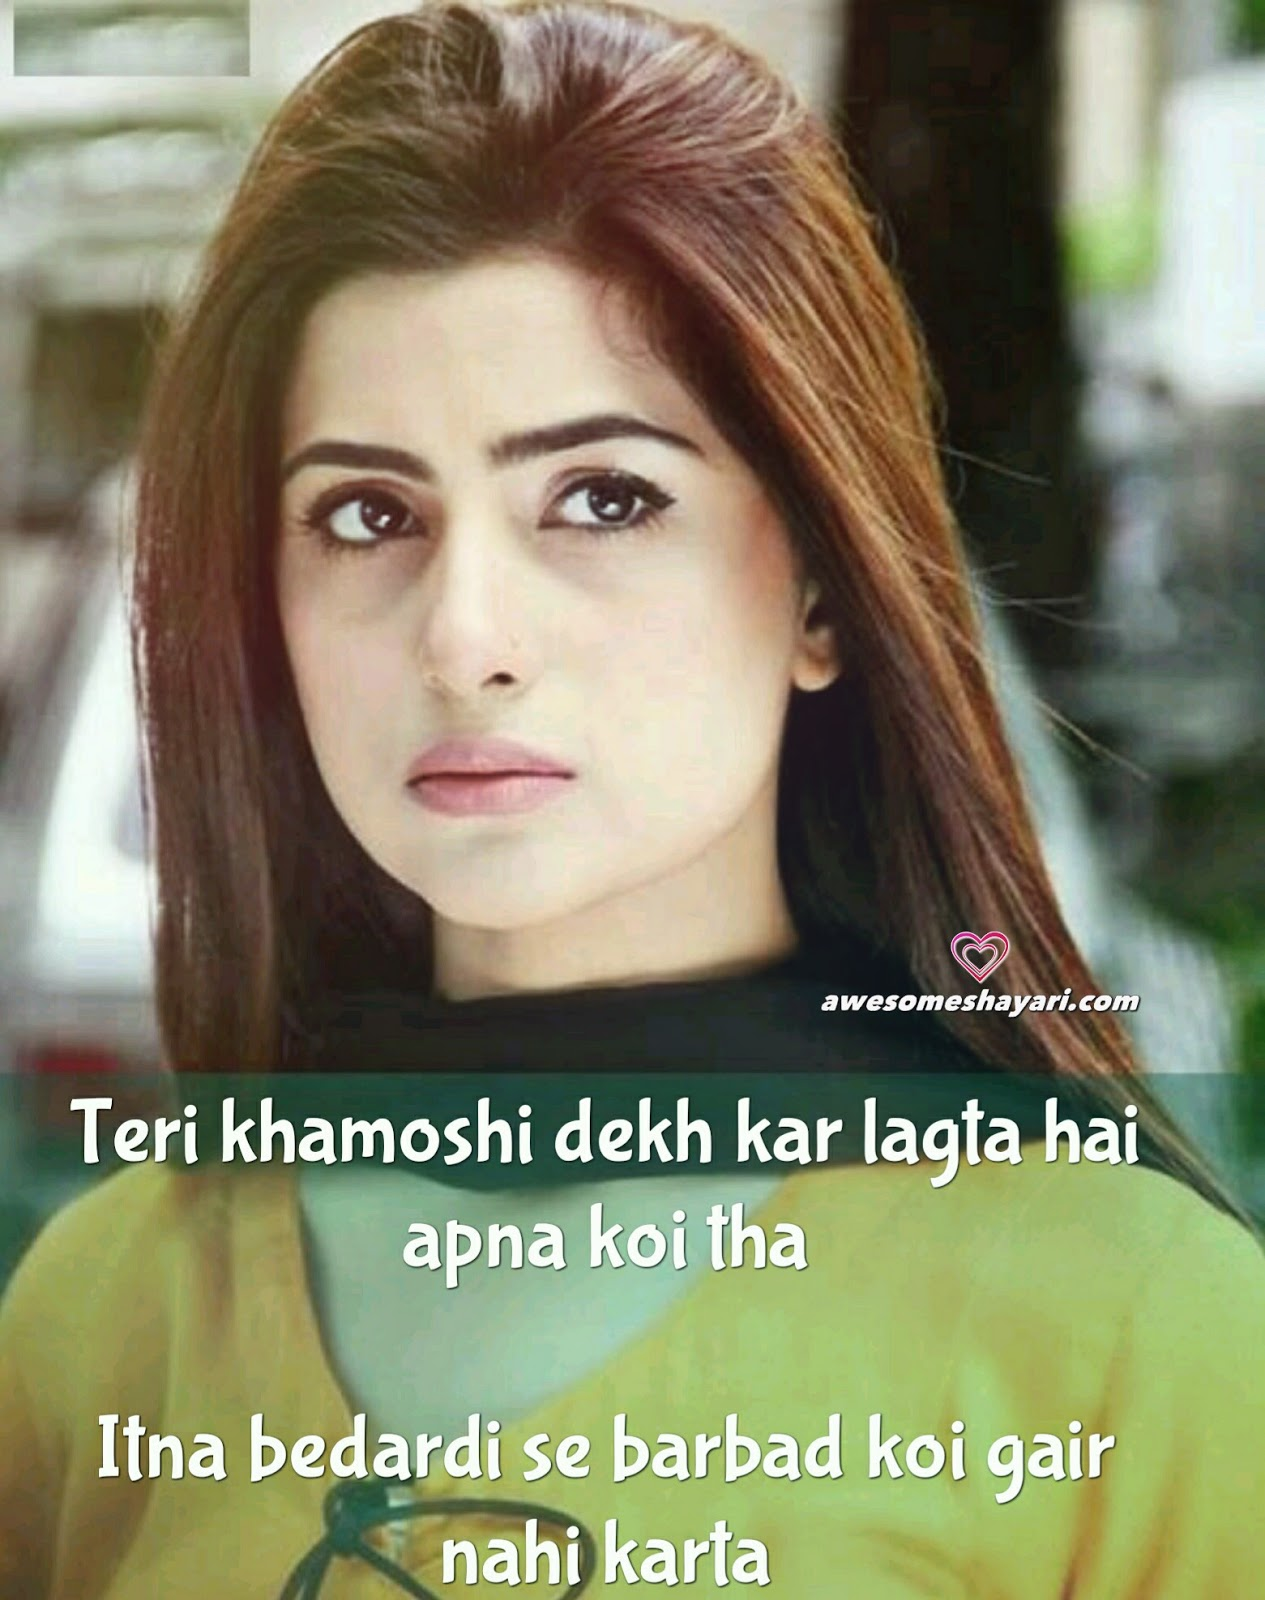 Aaj Se Teri: Heart Touching Shayari, Sad Love Shayari Images